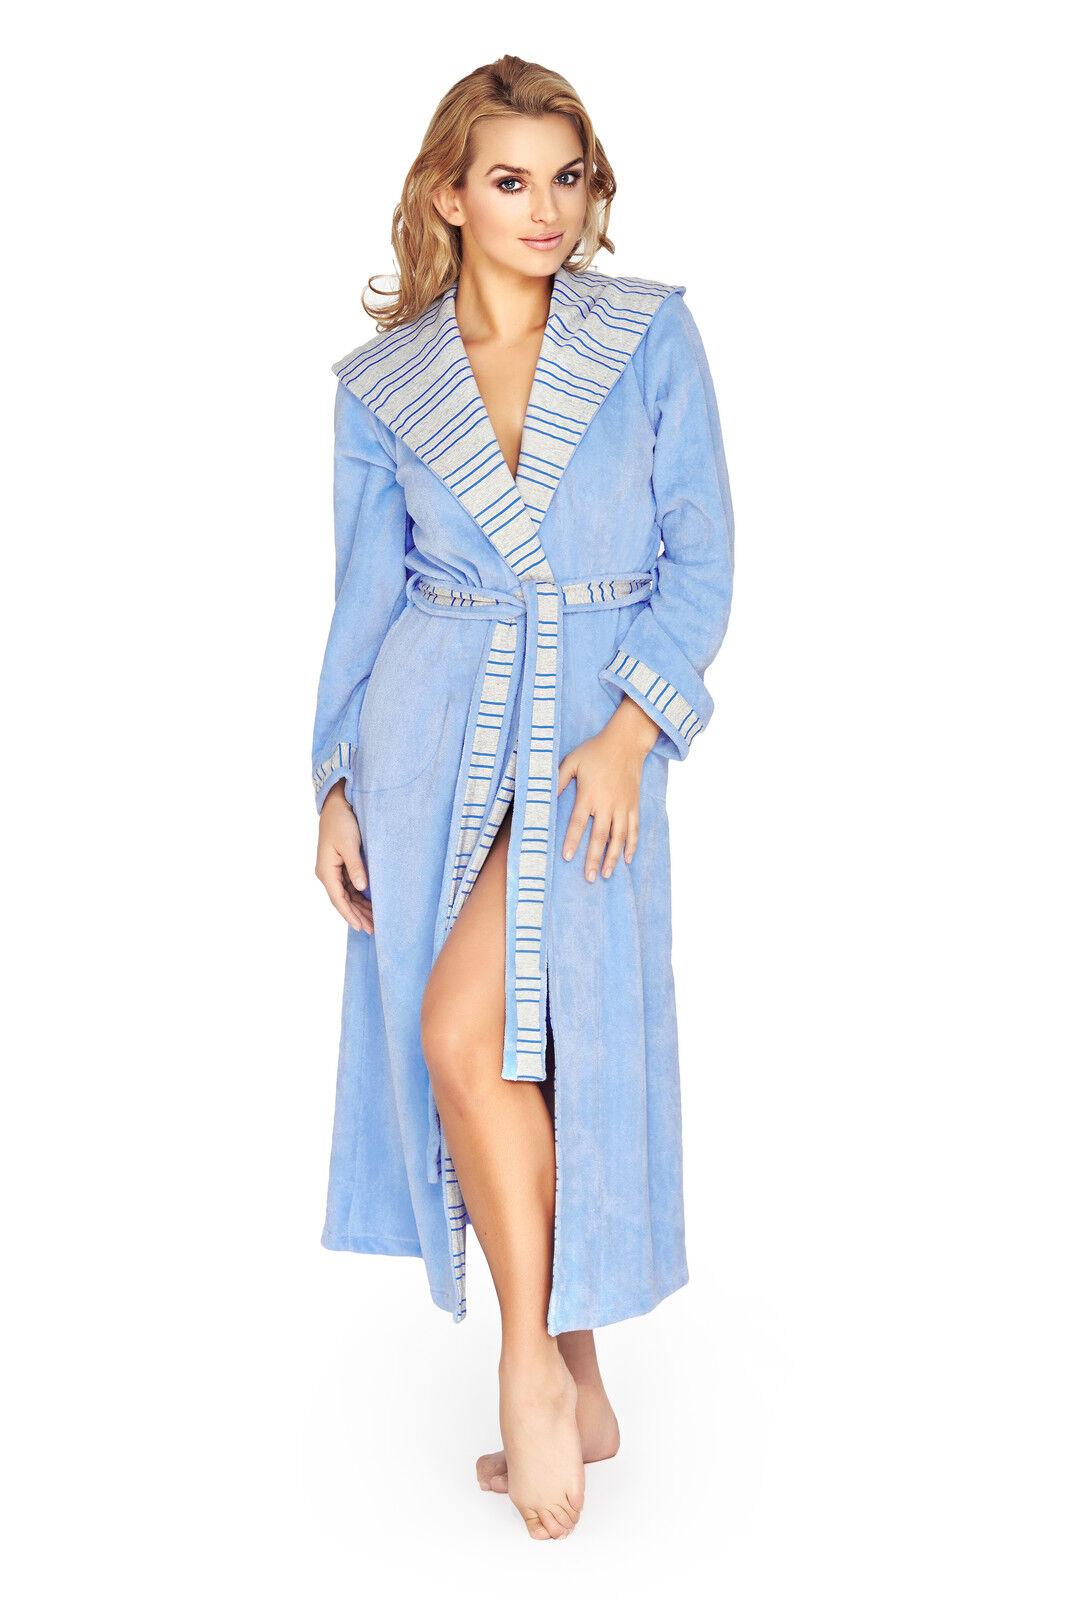 Women S Luxury Soft Cotton Bath Robe Housecoat Dressing